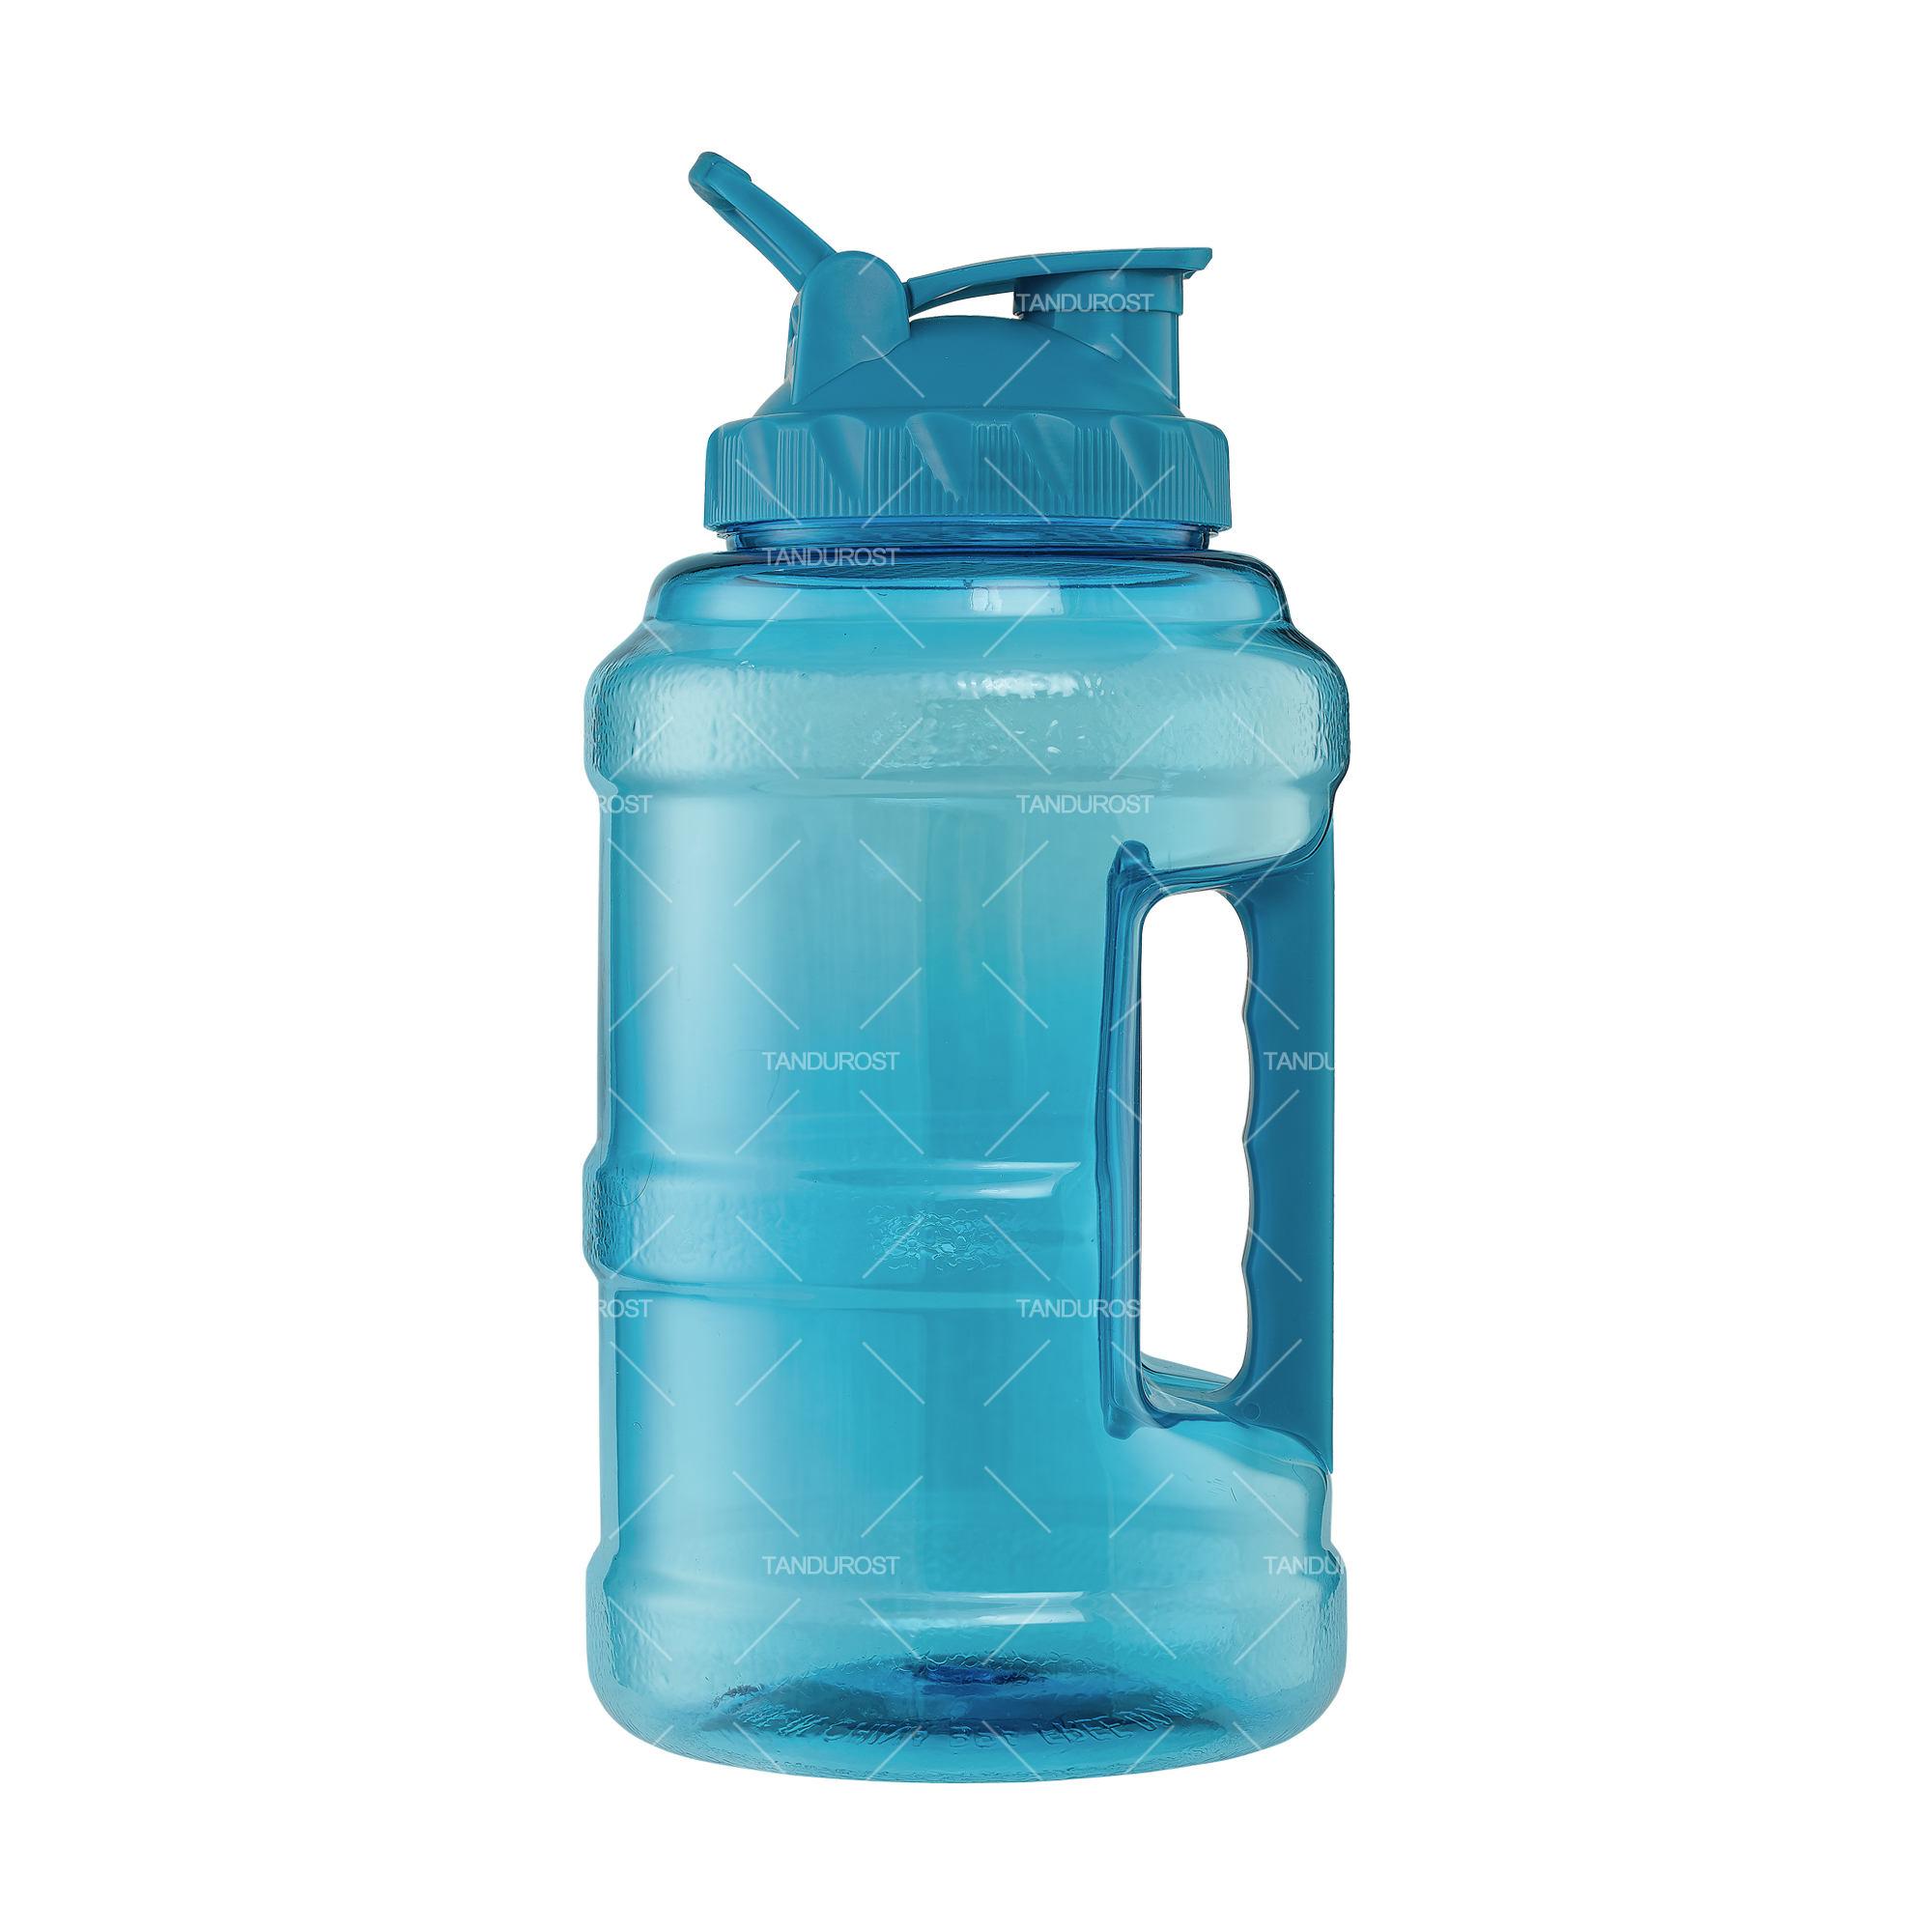 جاگ واتر شفاف 2.2 لیتری